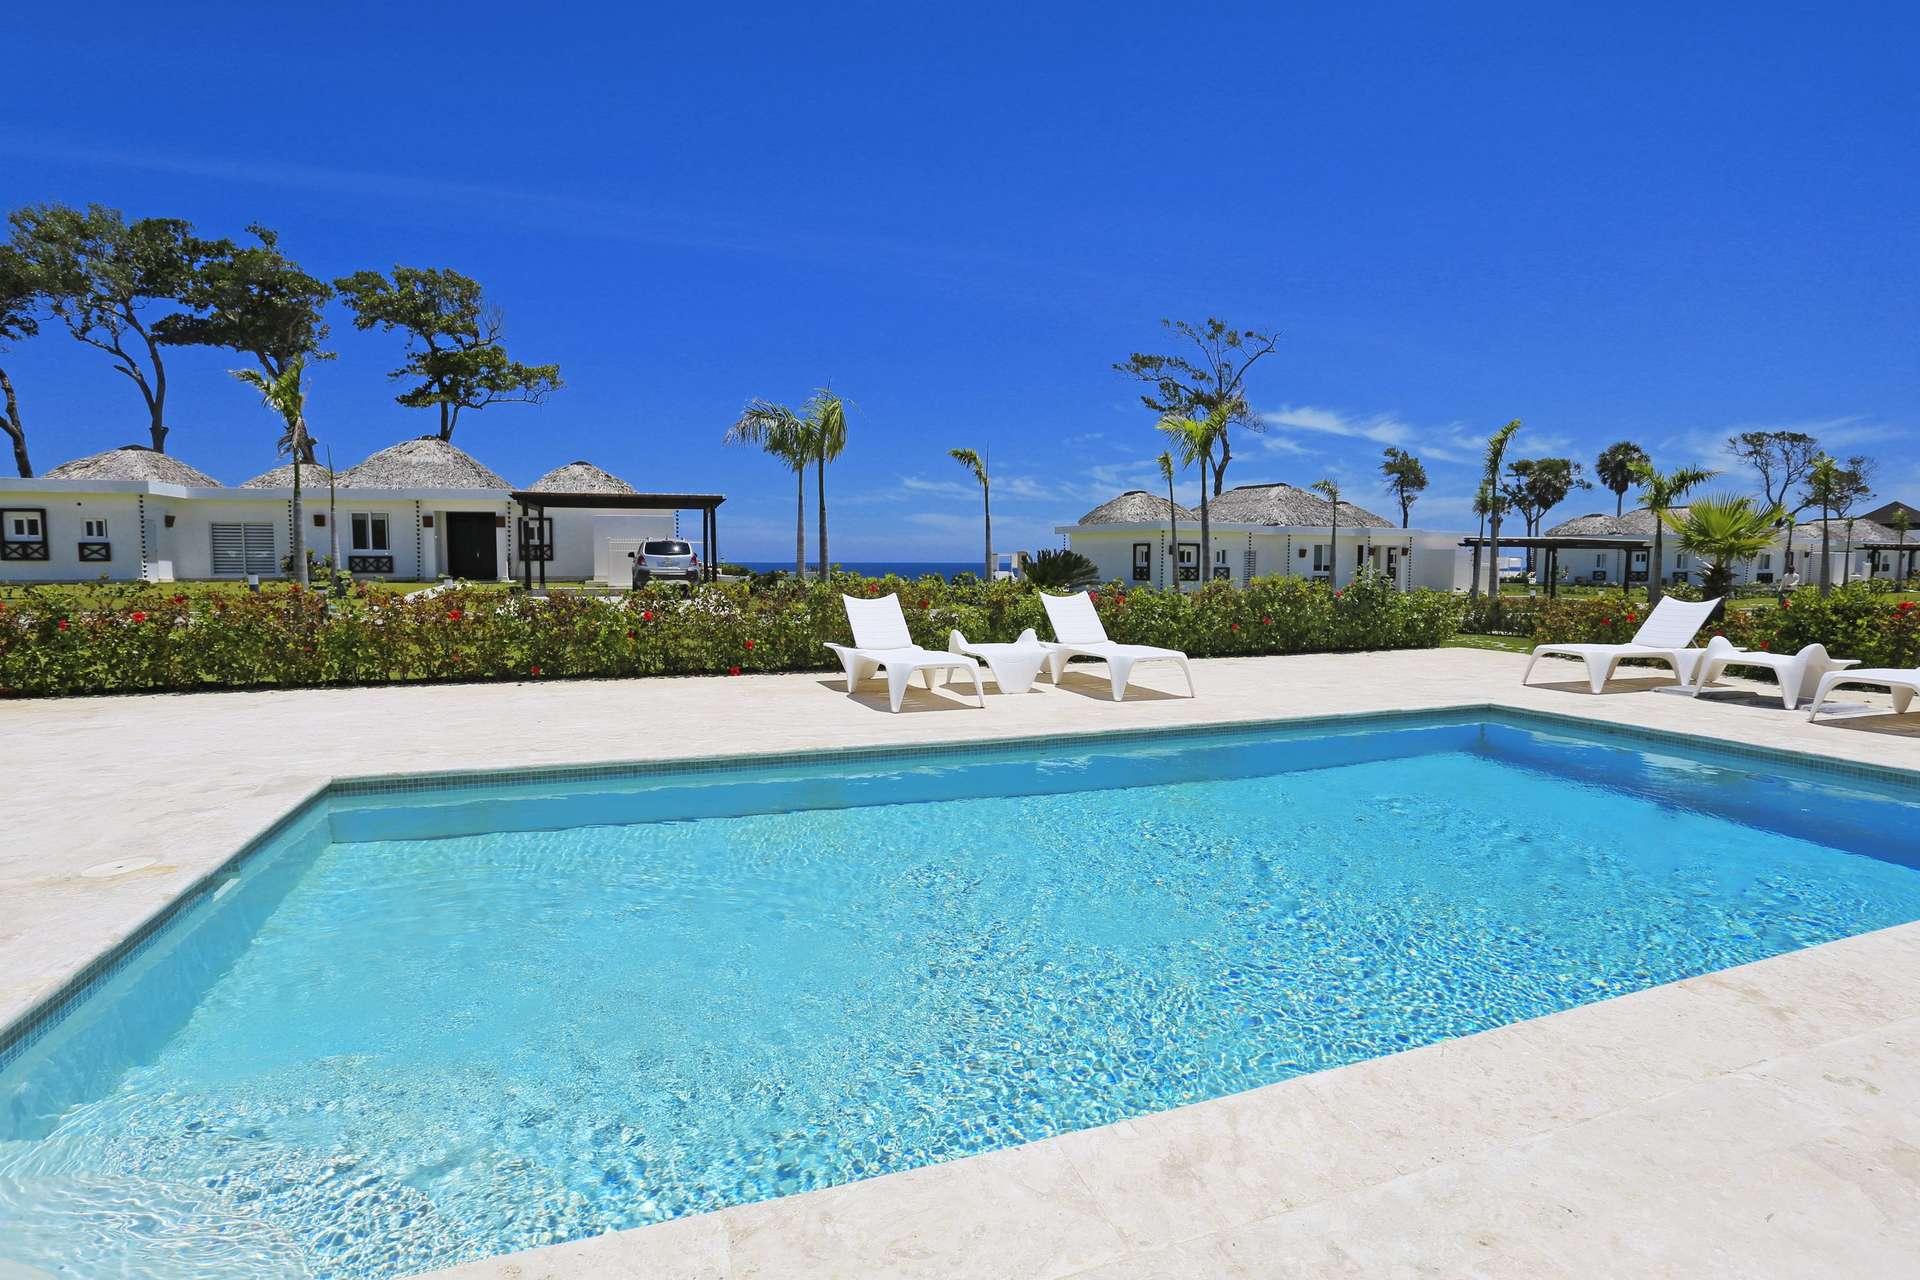 Luxury villa rentals caribbean - Dominican republic - Sosua - Ocean villagedeluxe - #12 | 3 BDM Ocean View - Image 1/10